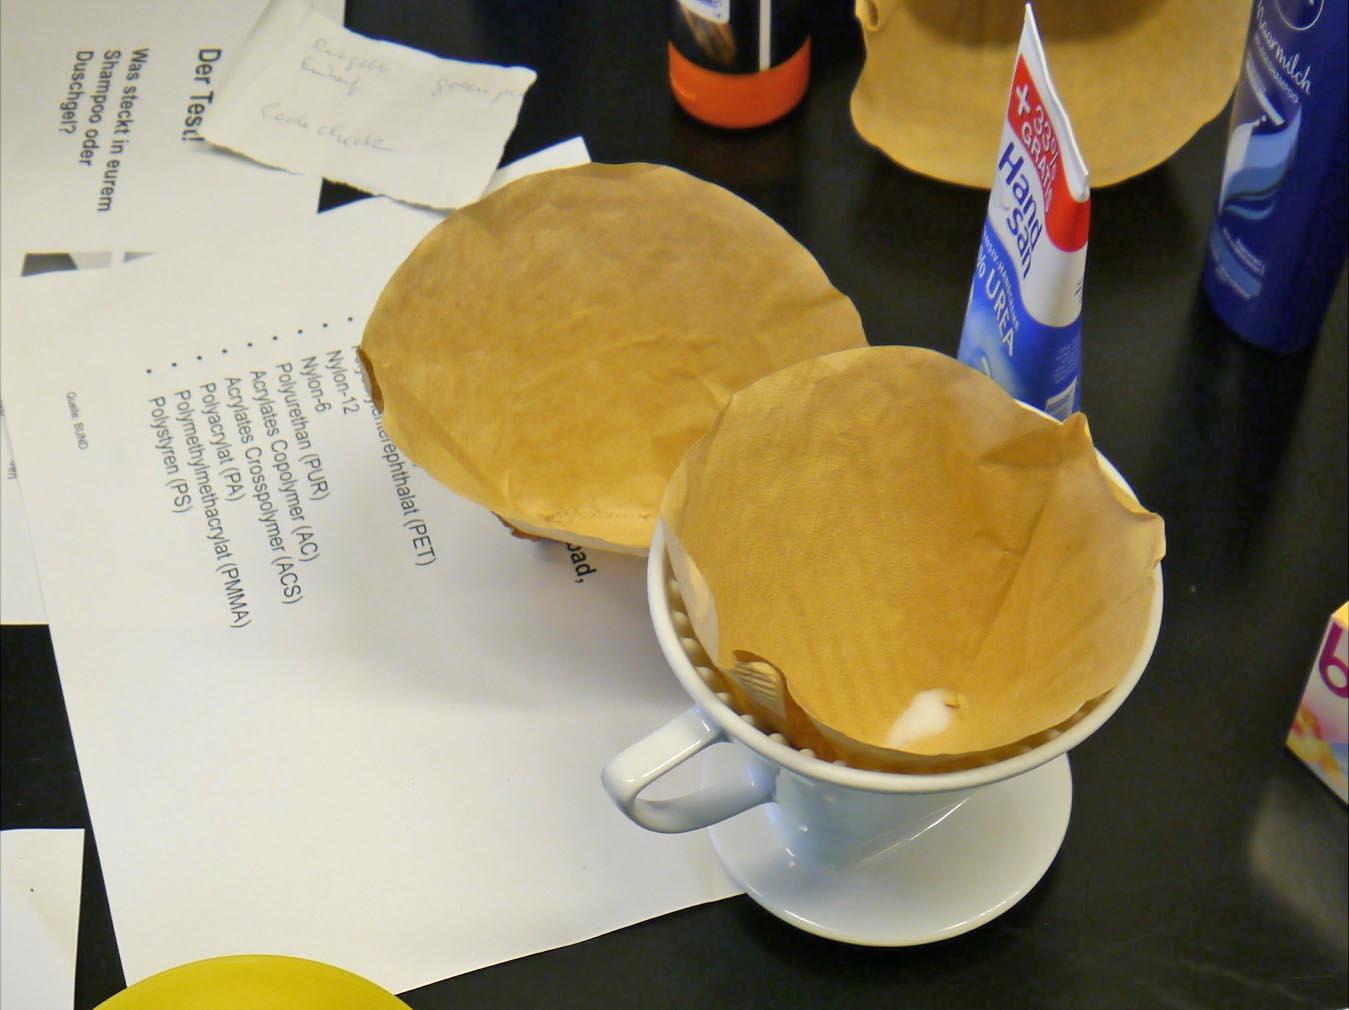 Zwei Kaffeefilter mit Filtertüten.